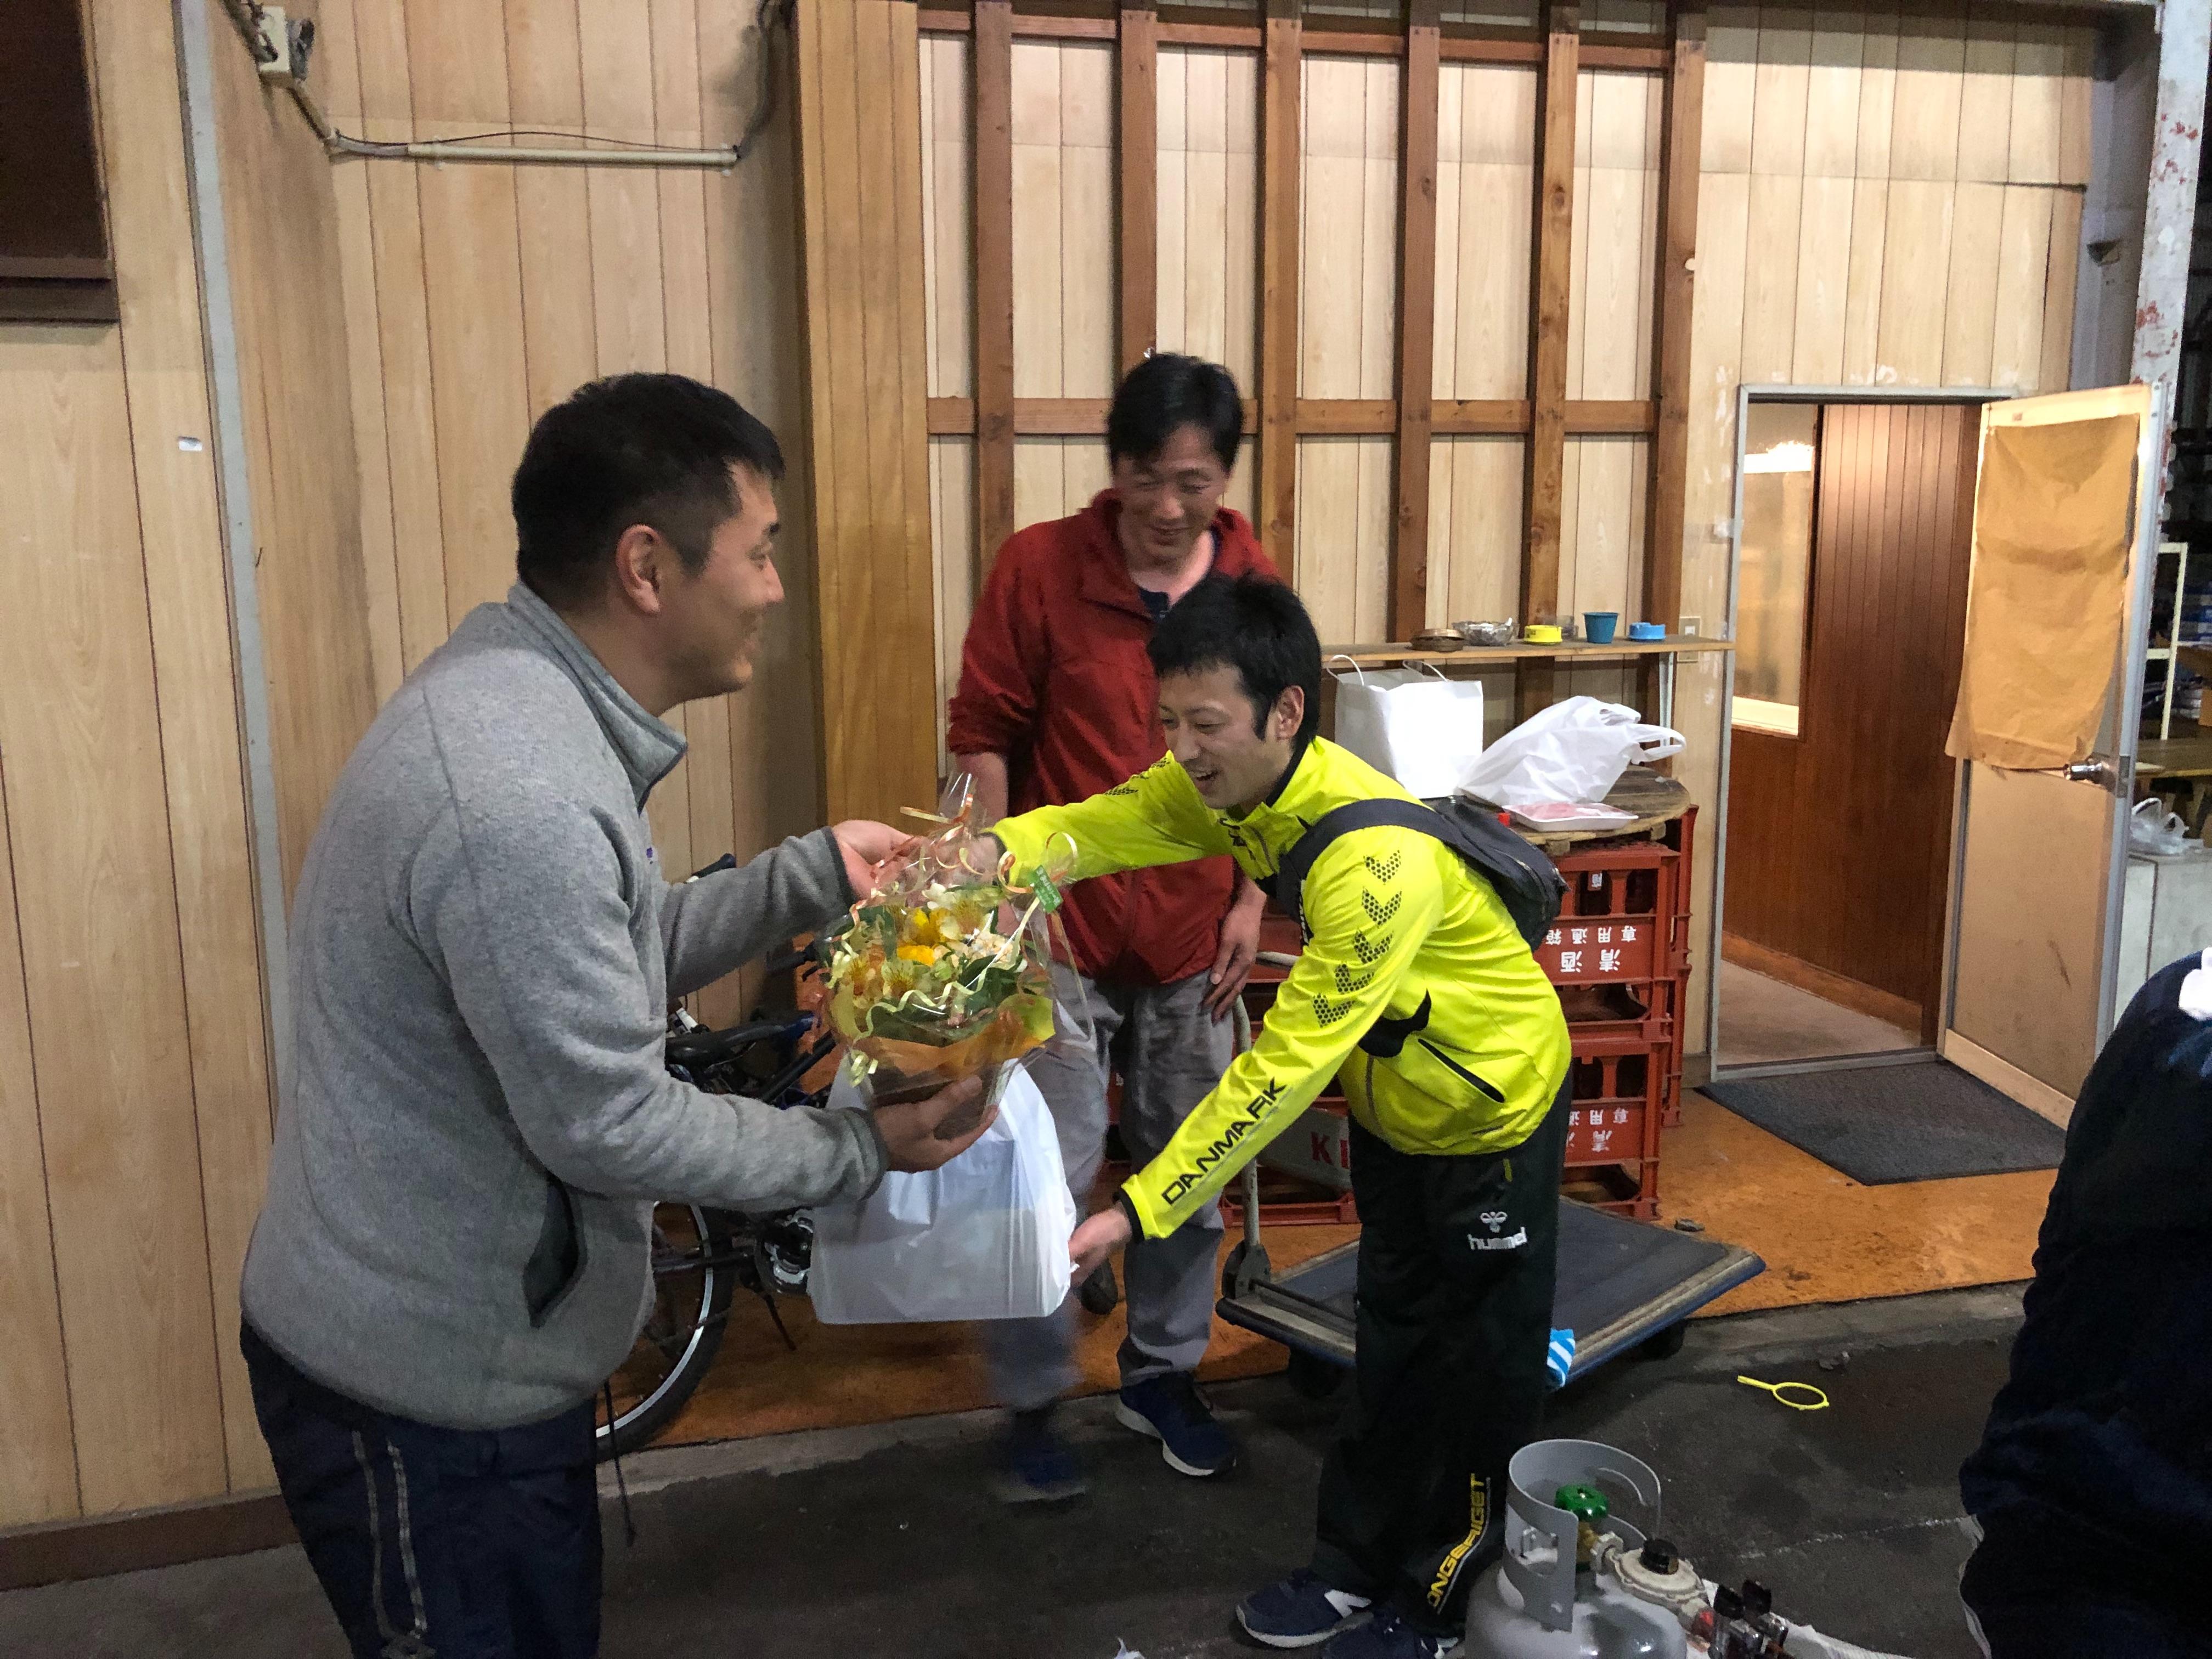 f:id:masanori-kato1972:20190322135643j:image